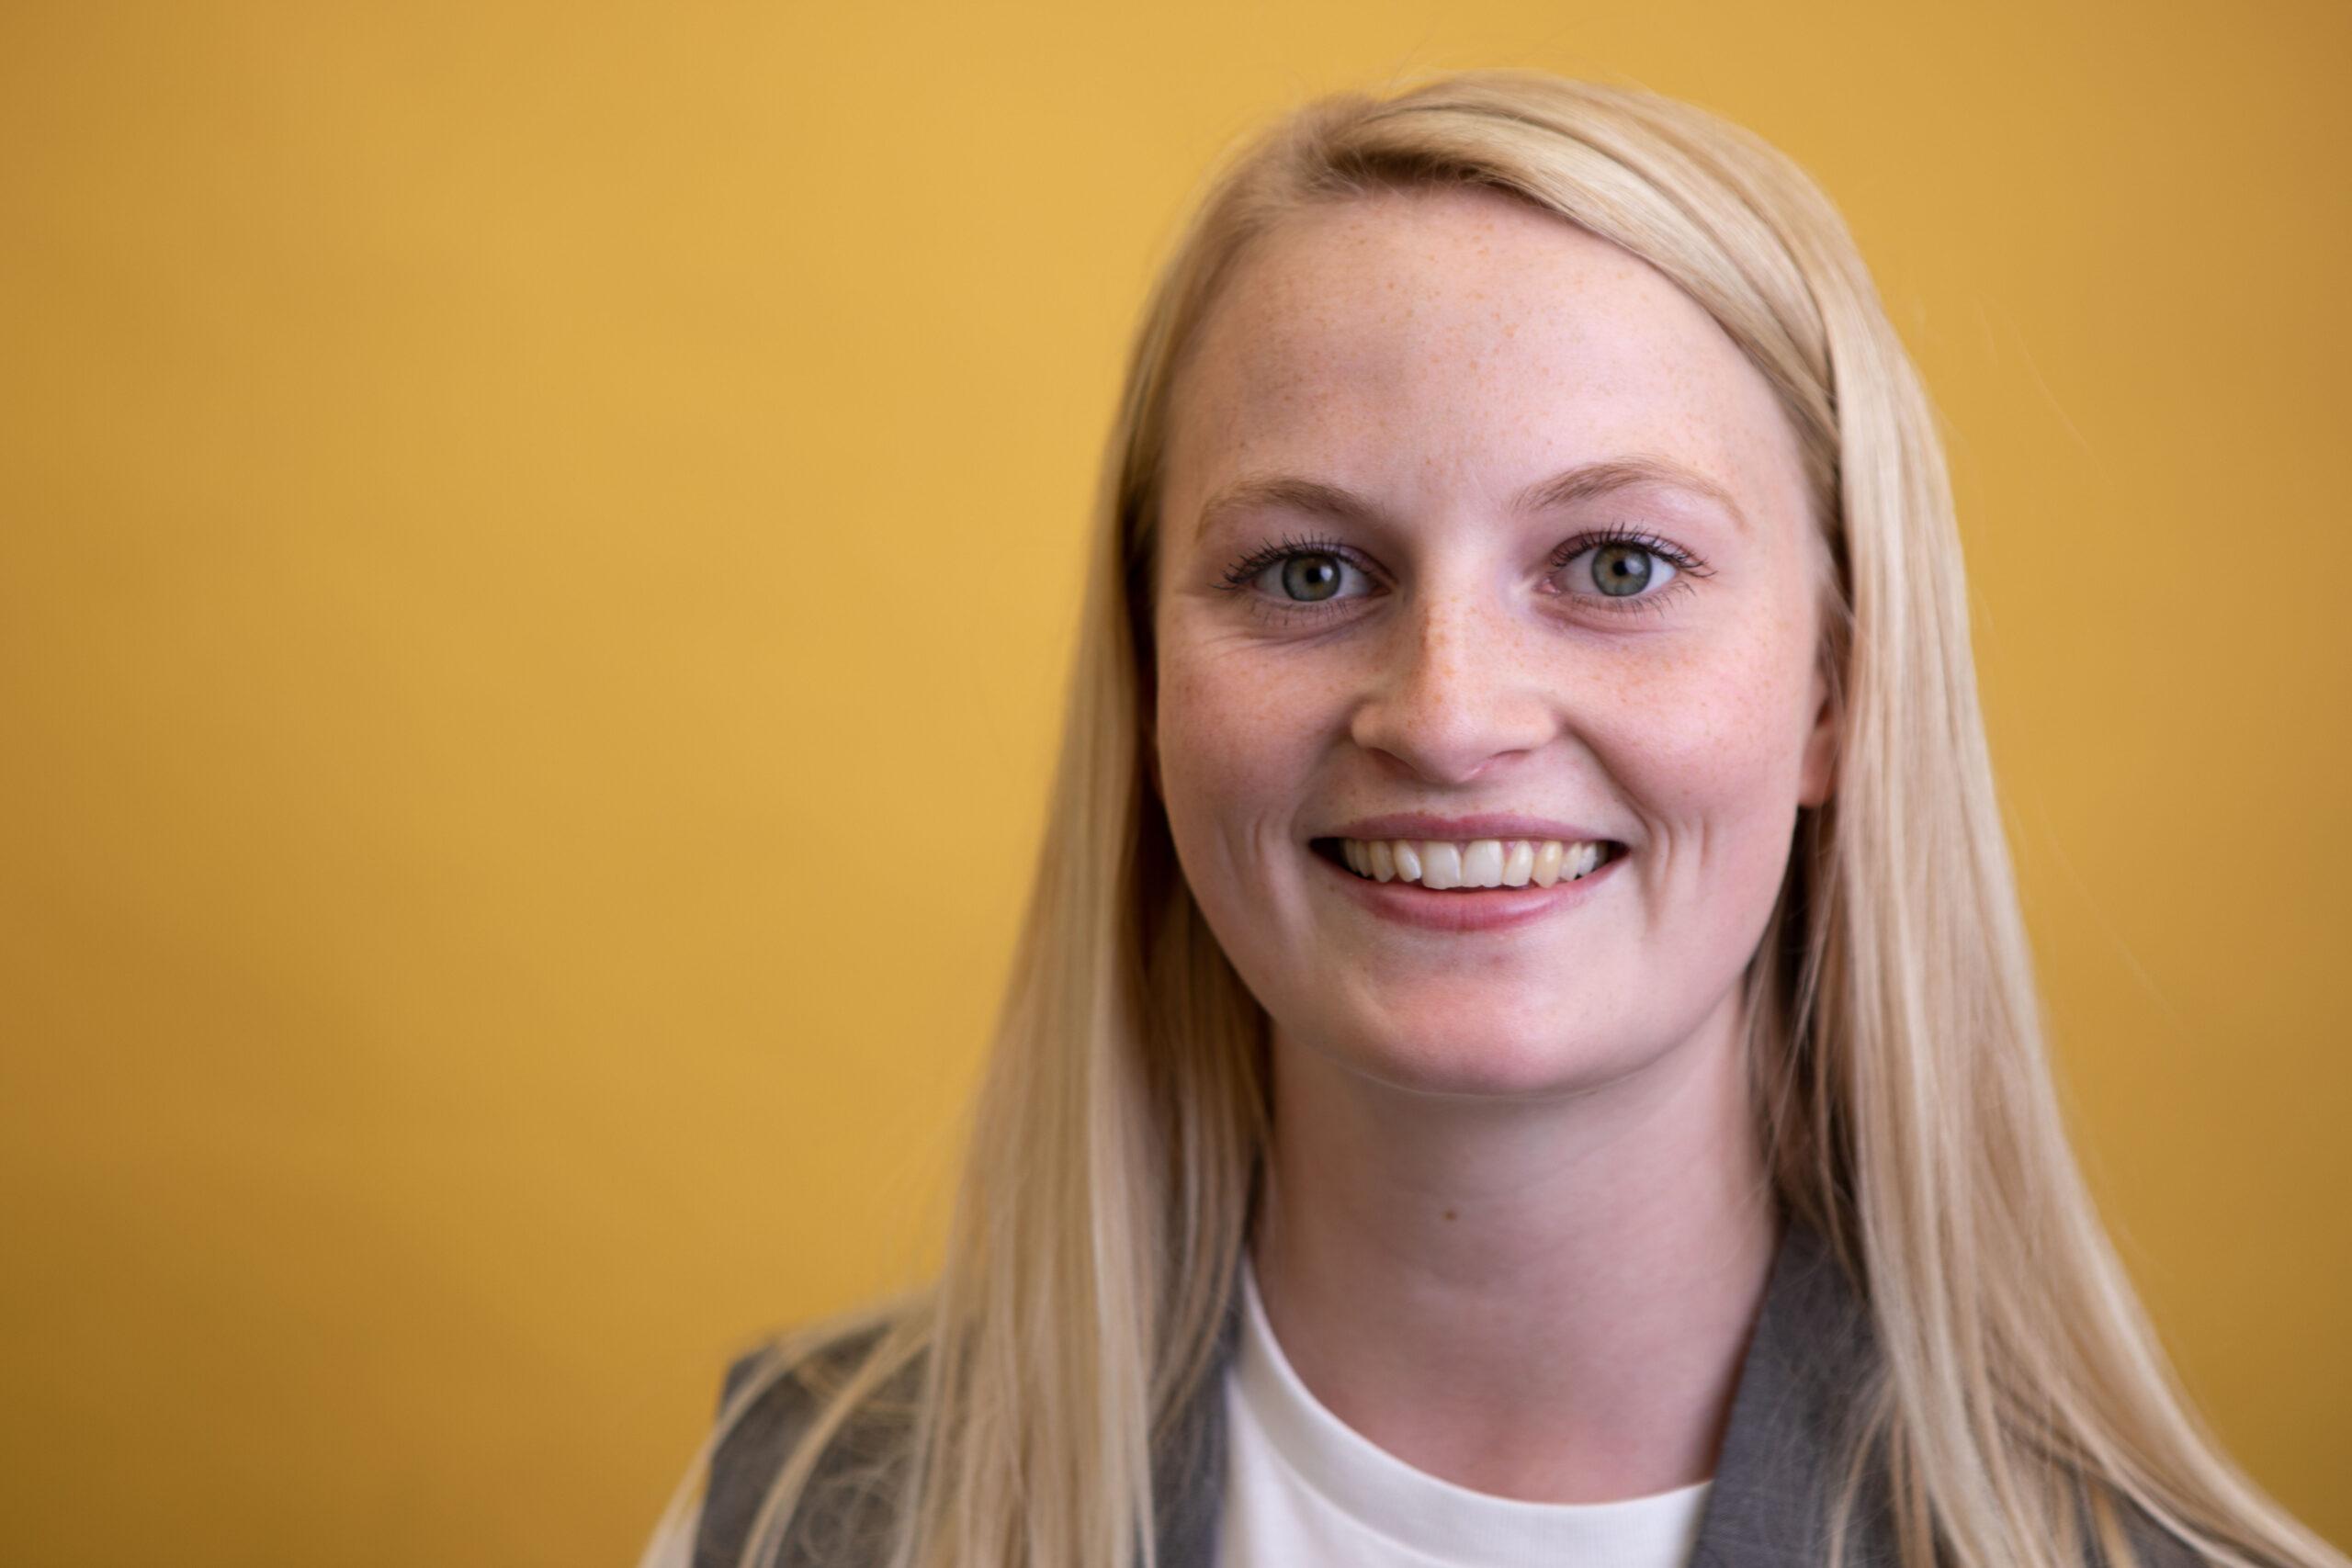 Laura Nicolajsen